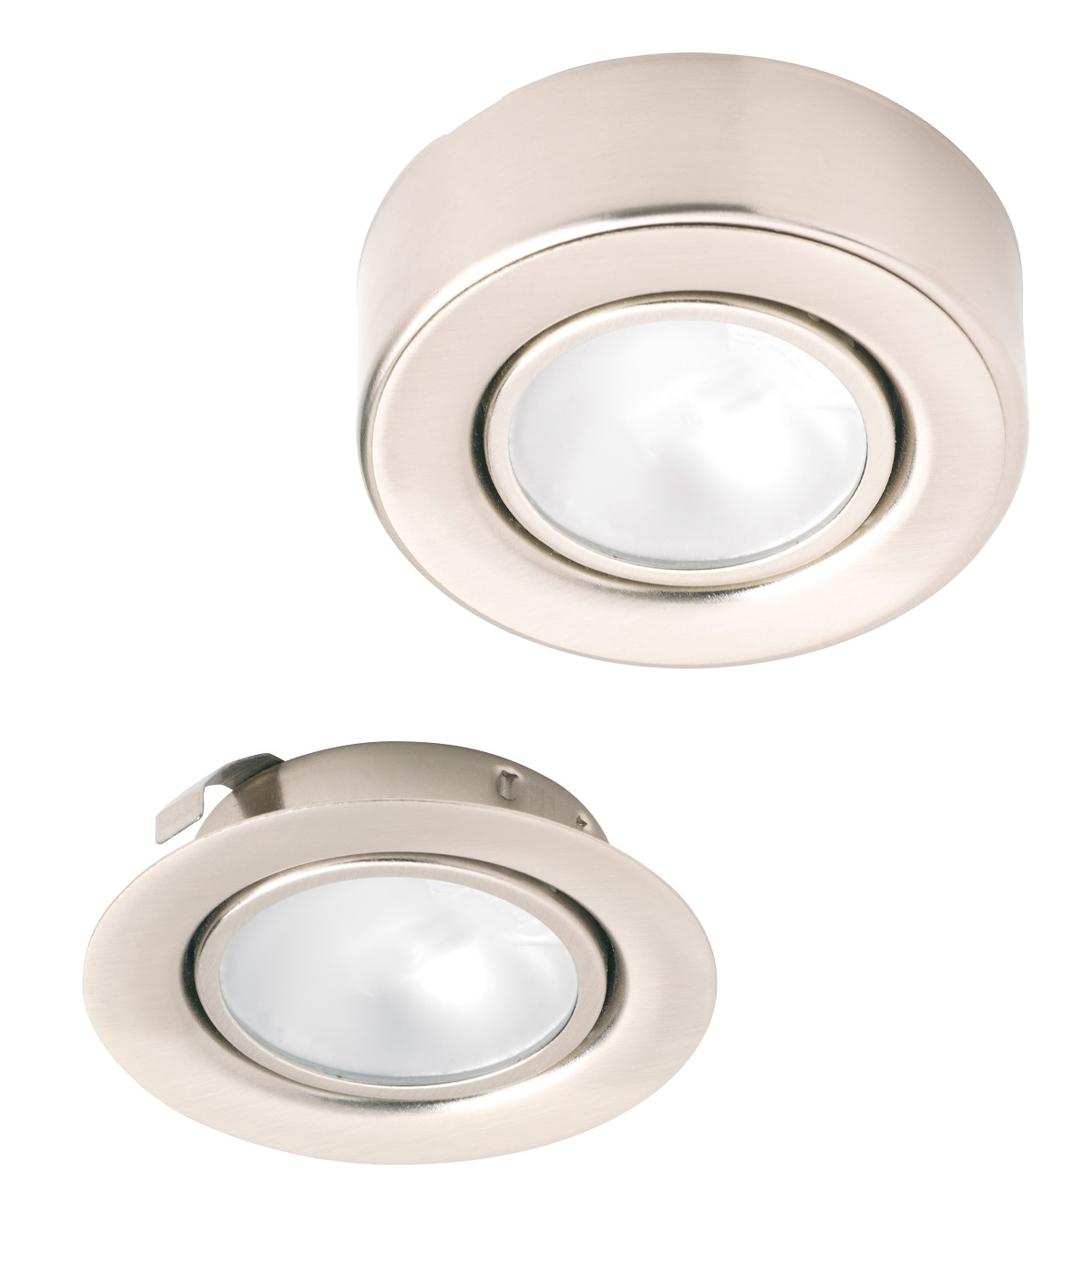 Kitchen Under Cabinet Light Unit Cupboard Glass Square Halogen White 20w 12v G4